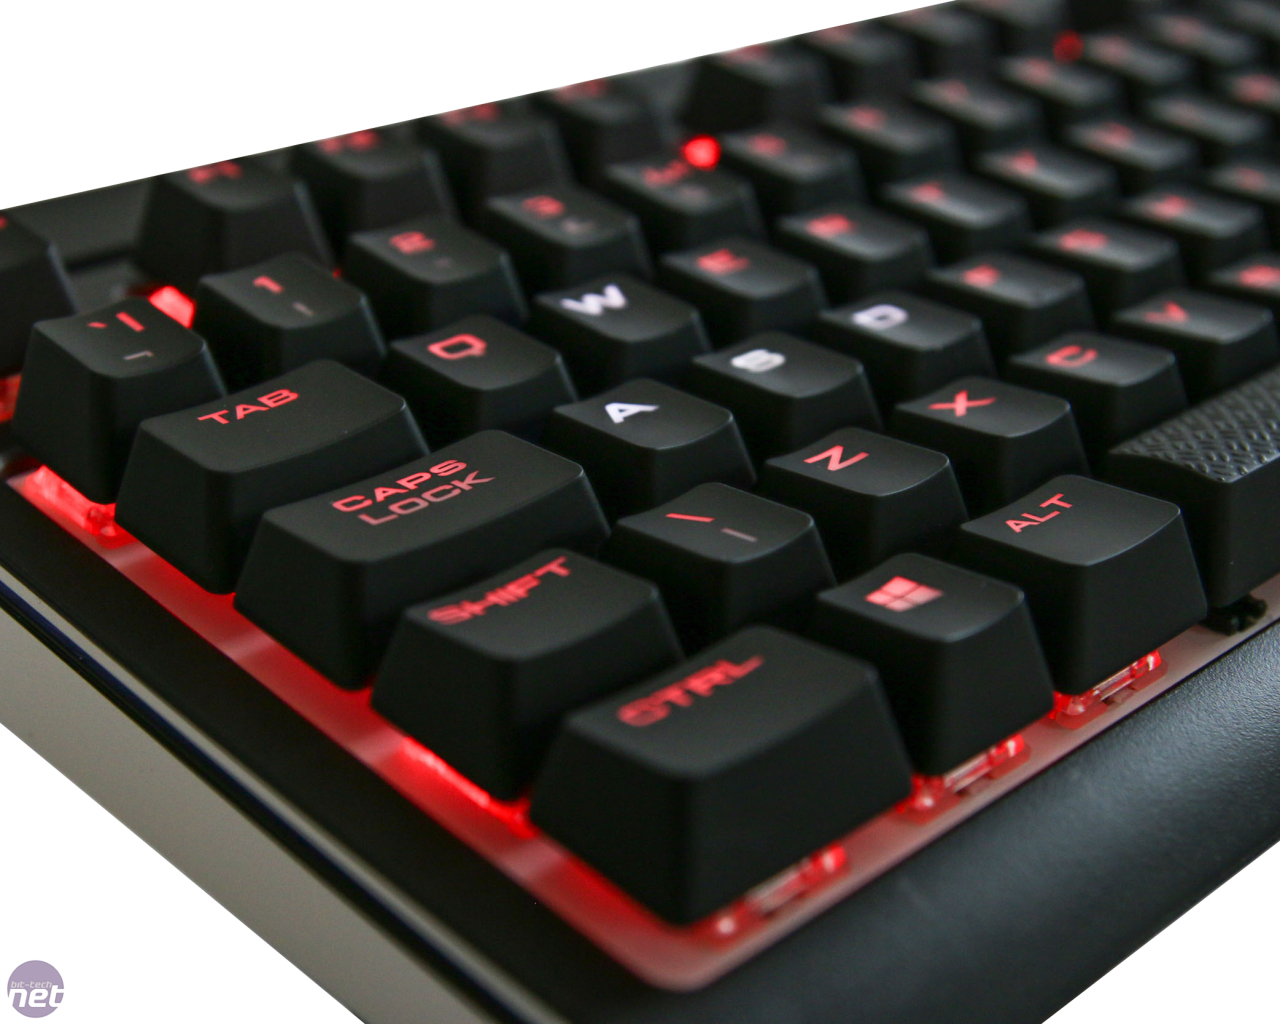 Corsair Strafe Rgb Mx Silent Review Gaming Cherry Brown